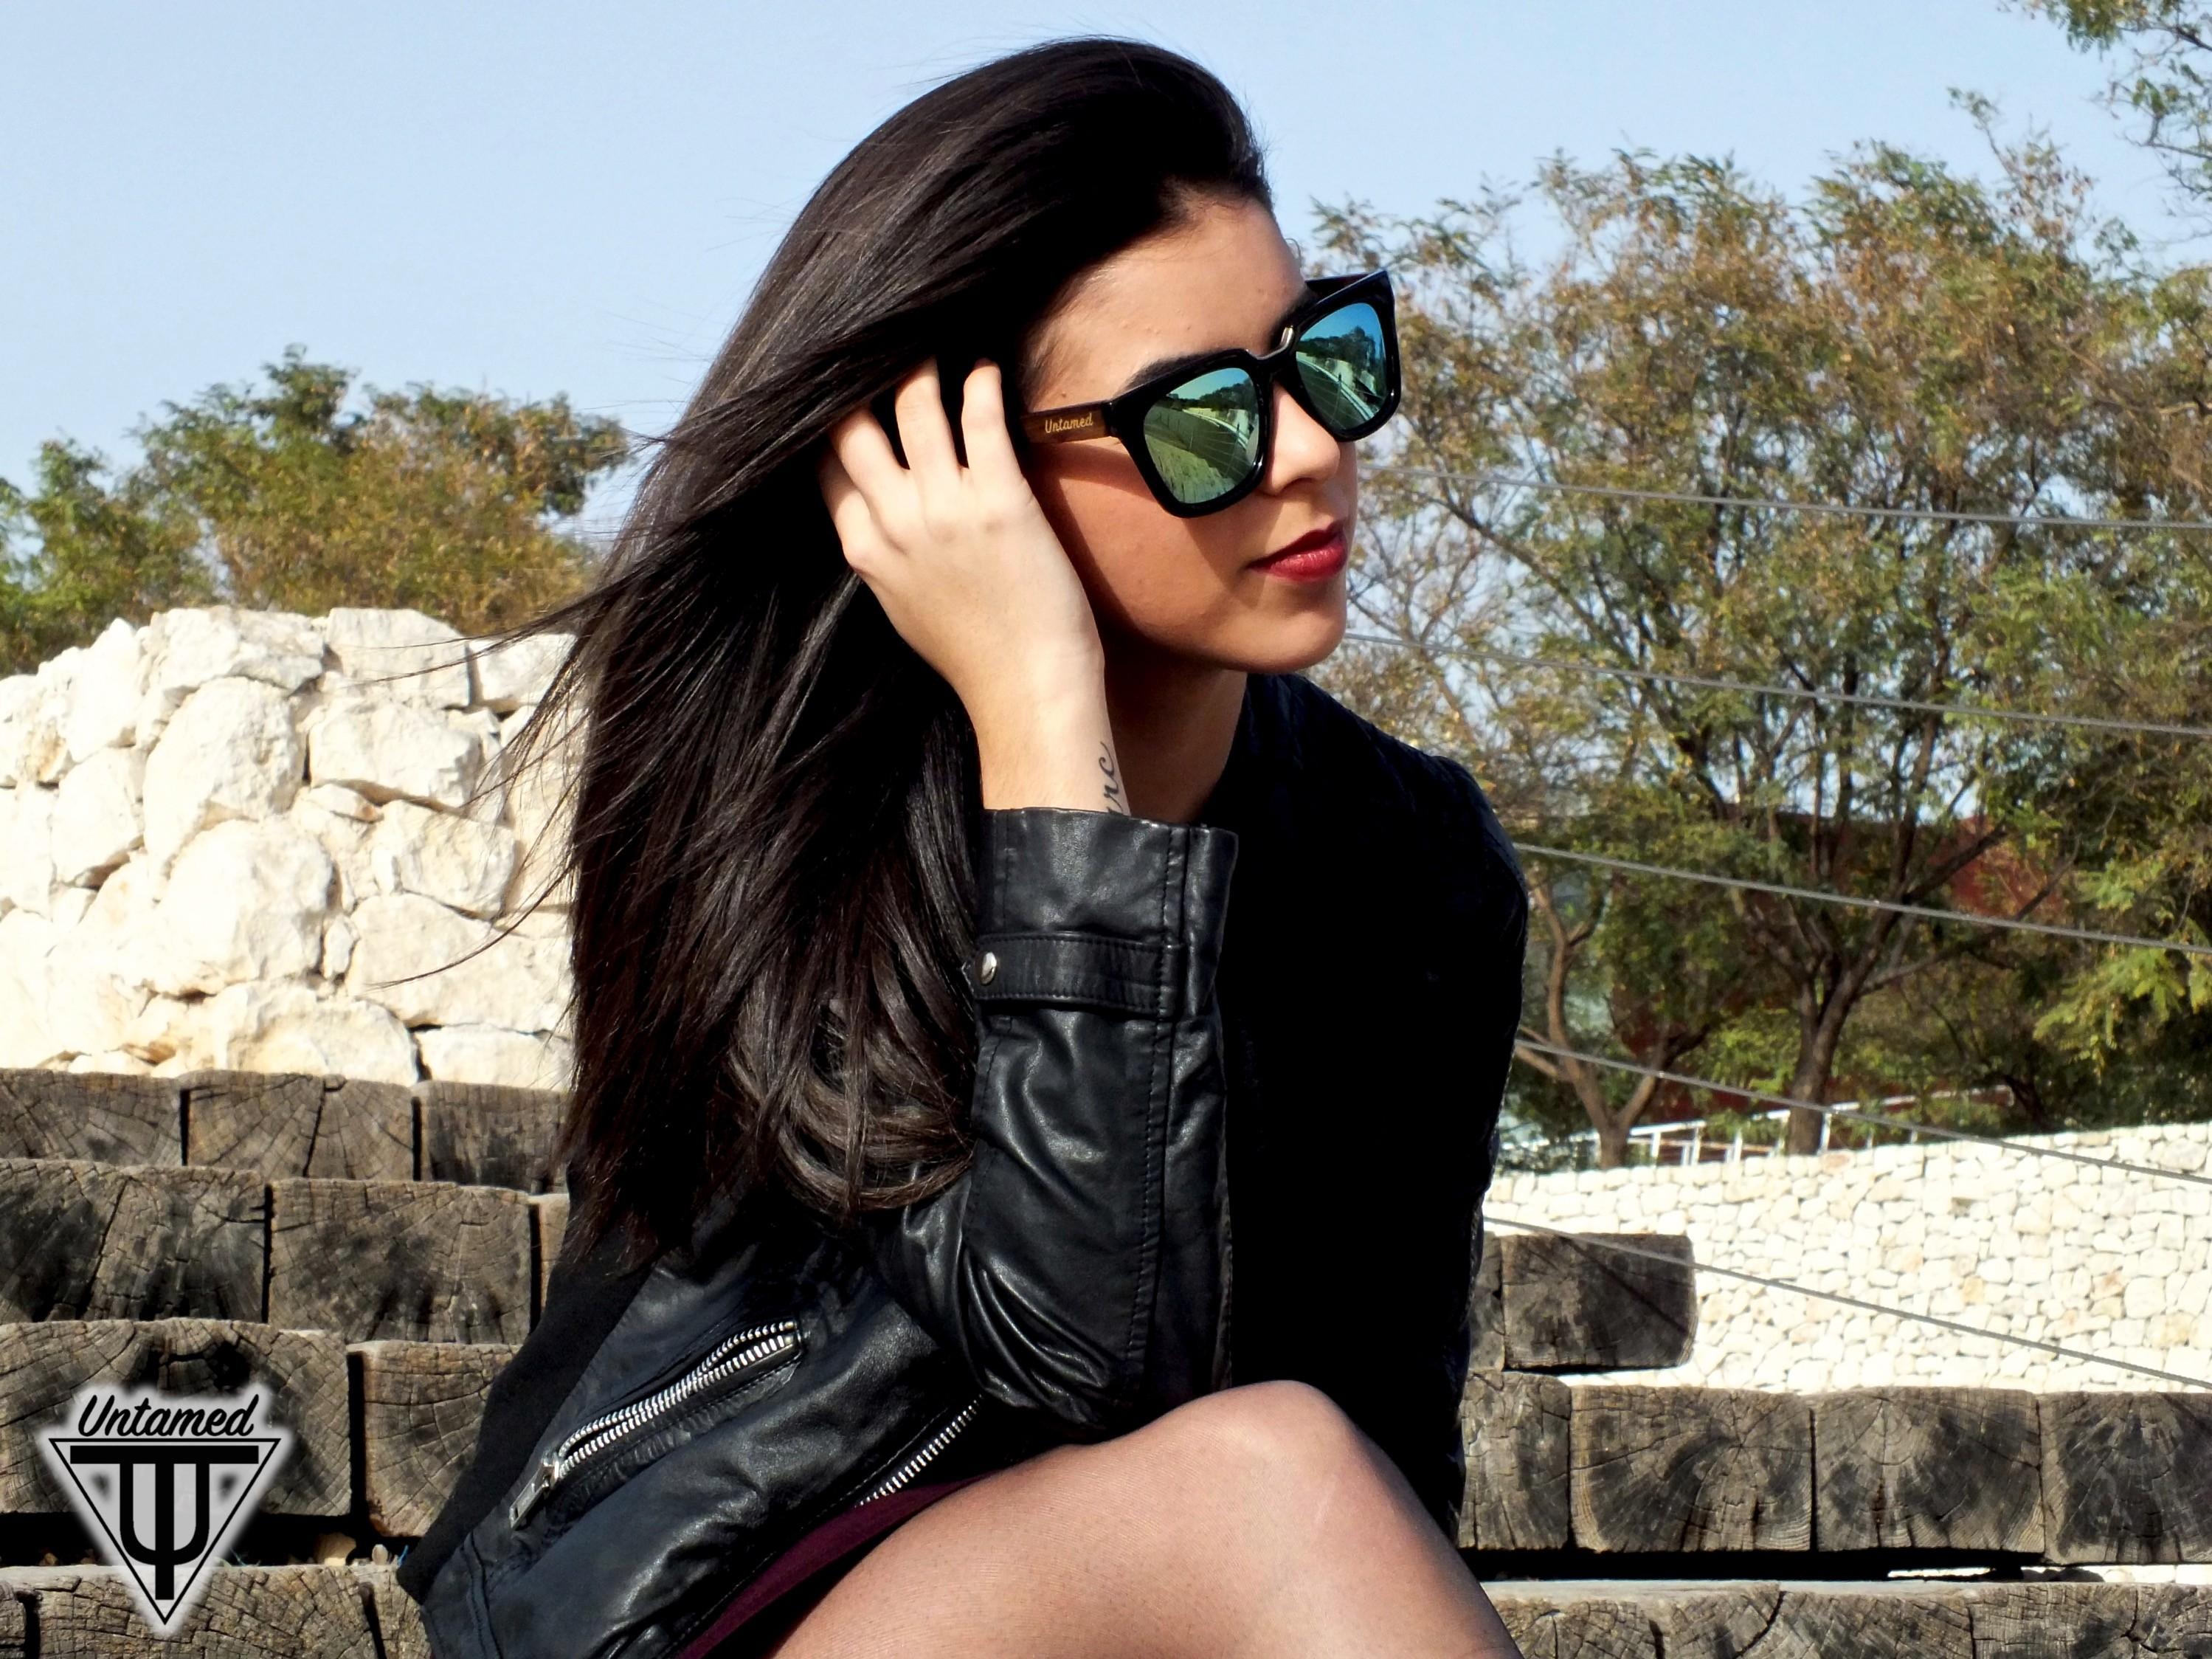 Wood Sunglasses - Untamed World